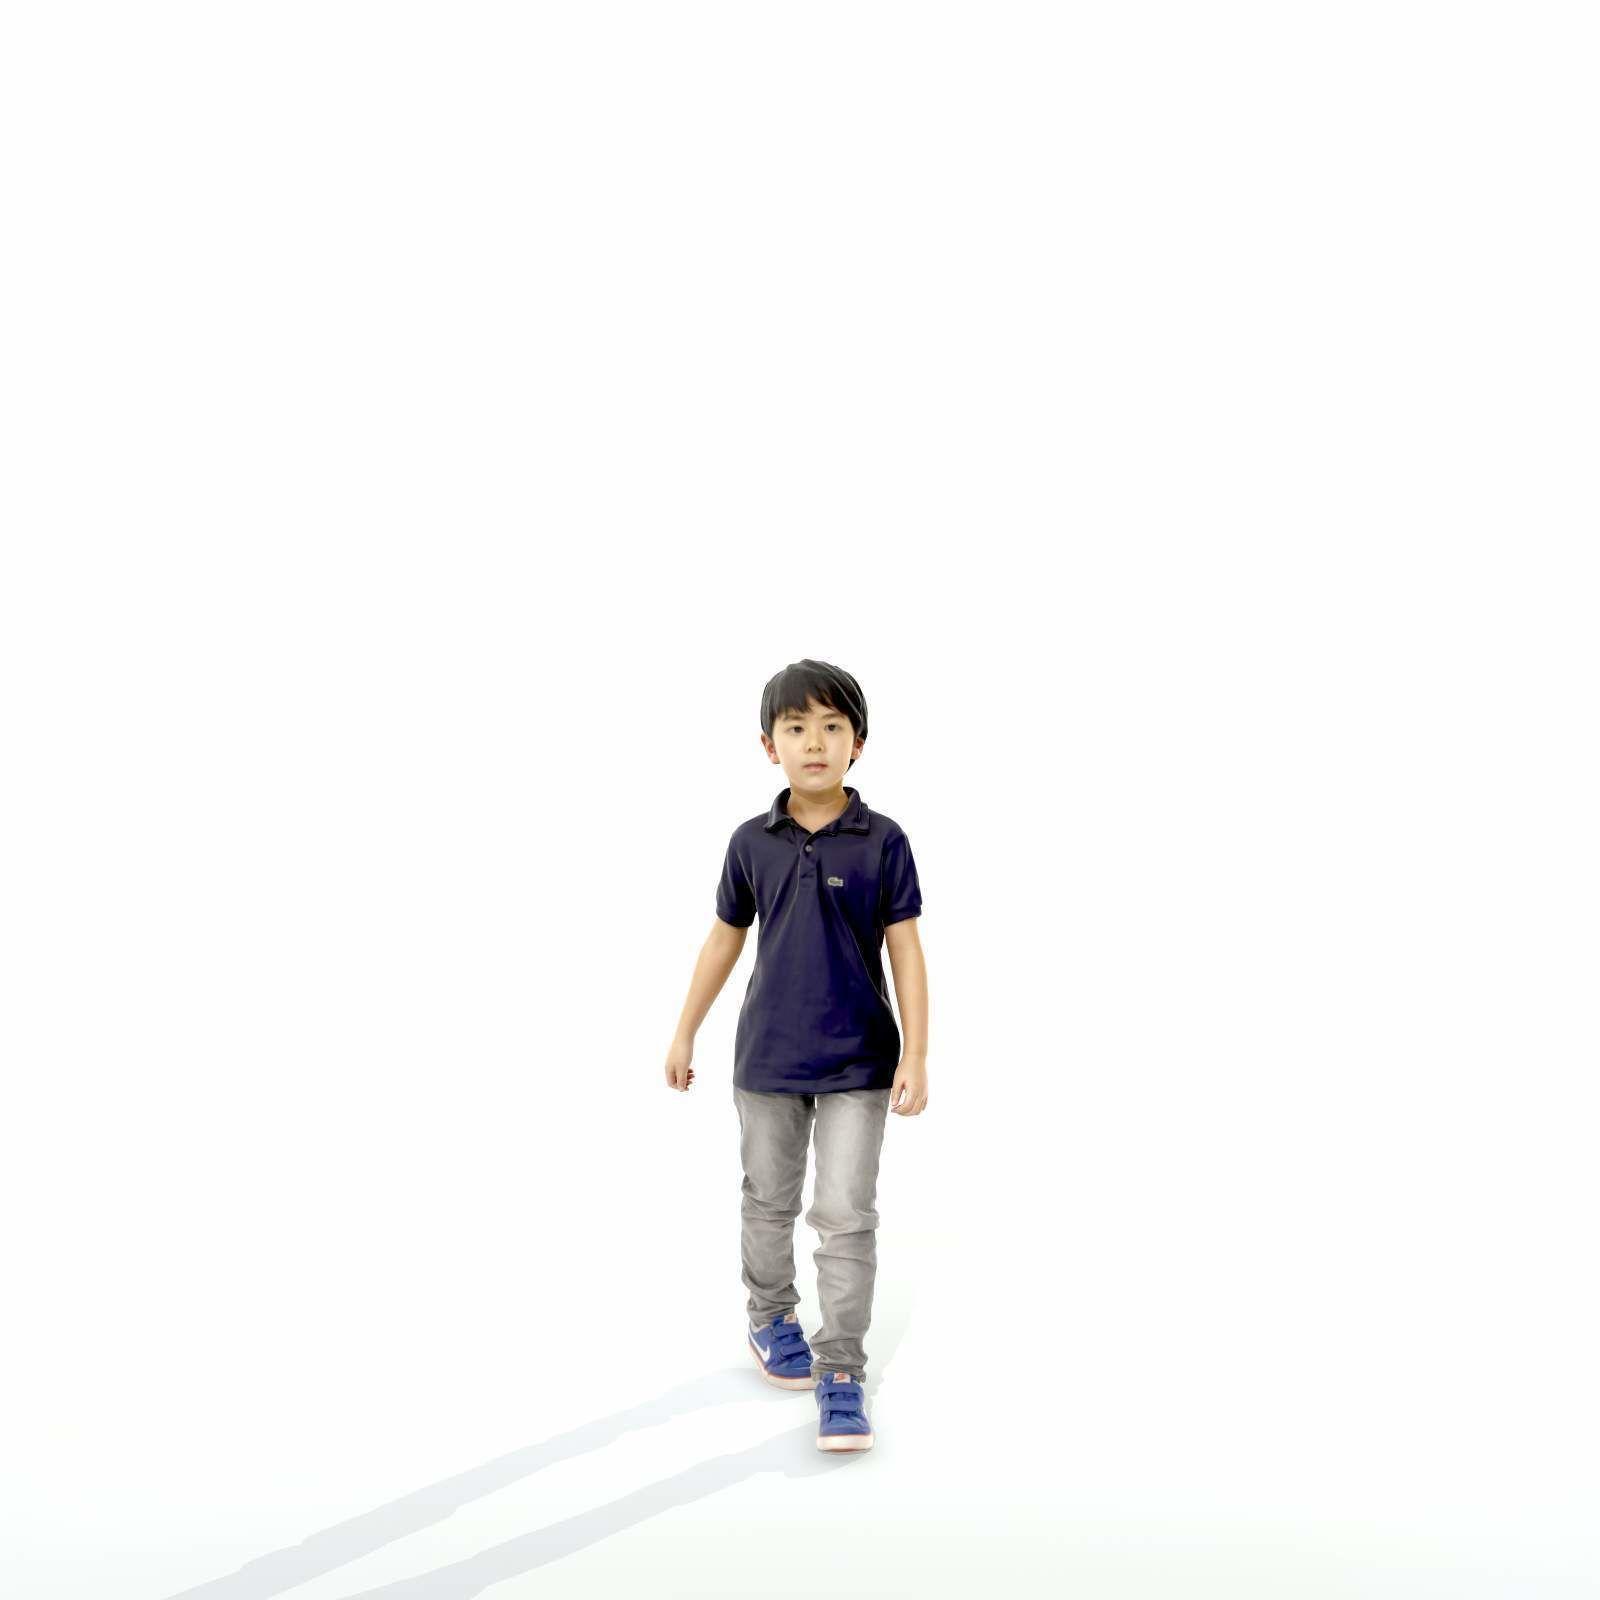 Small Boy Walking with Black Polo T-Shirt CBoy0300-HD2-O03P01-S